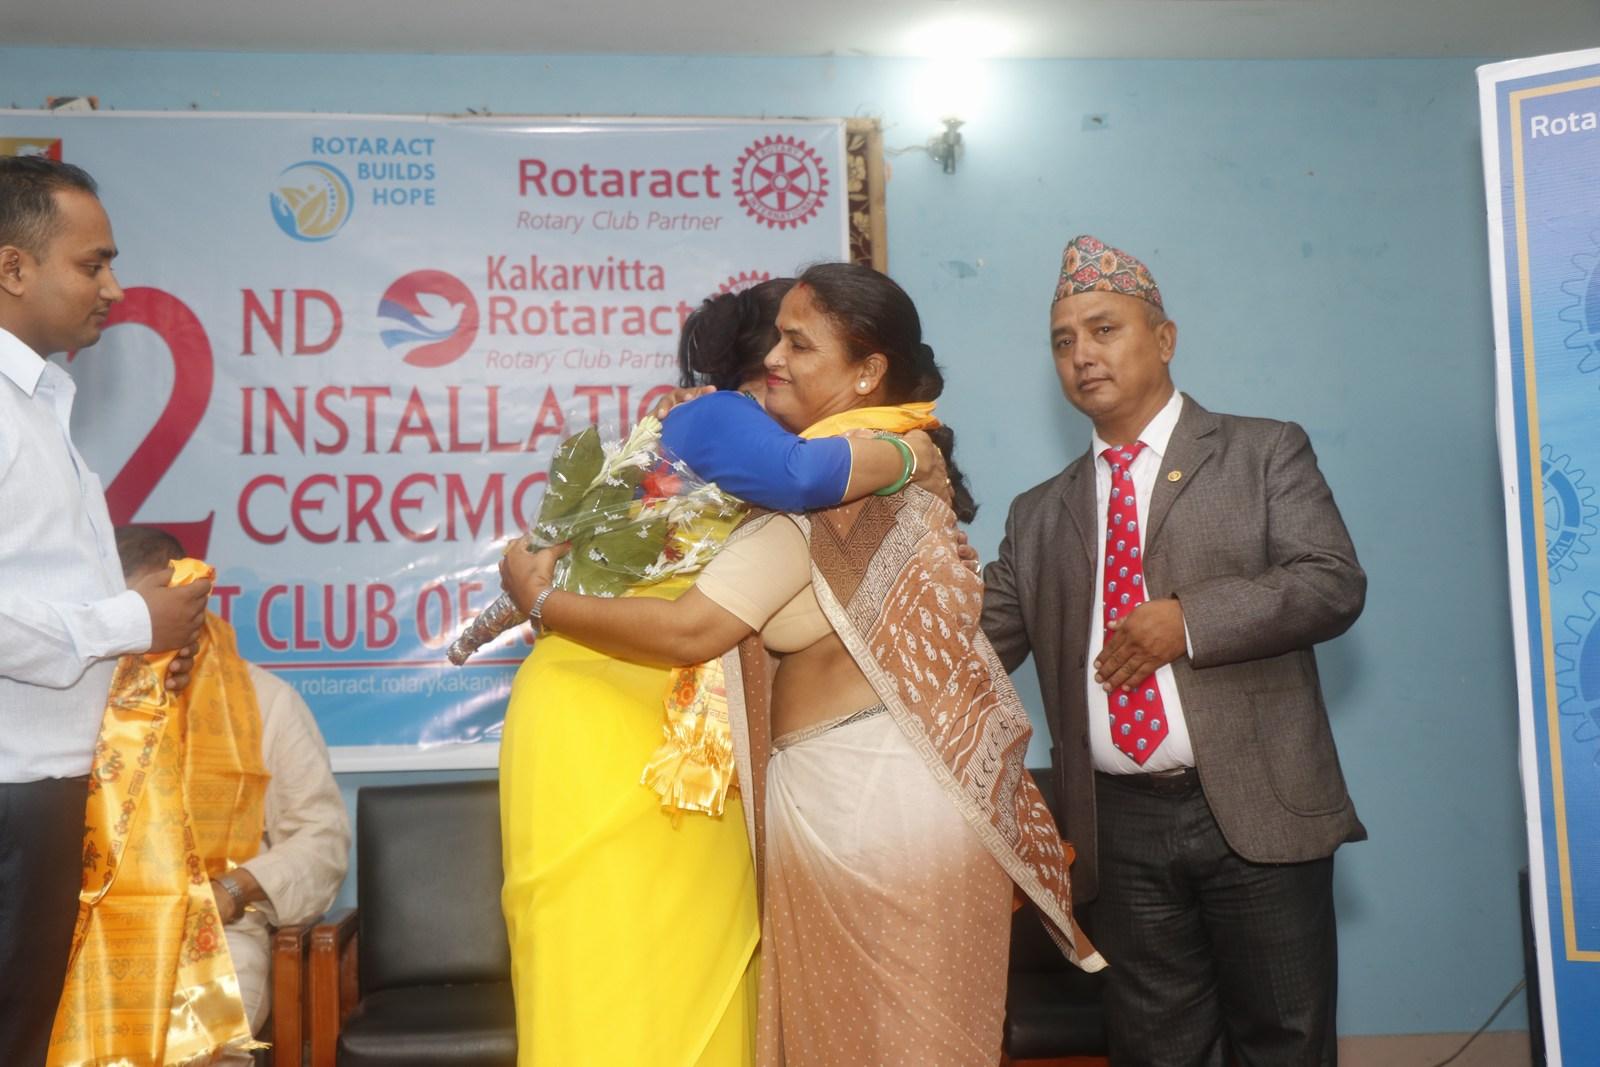 8th-Installation-Ceremony-Rotary-Club-of-Kakarvitta-8